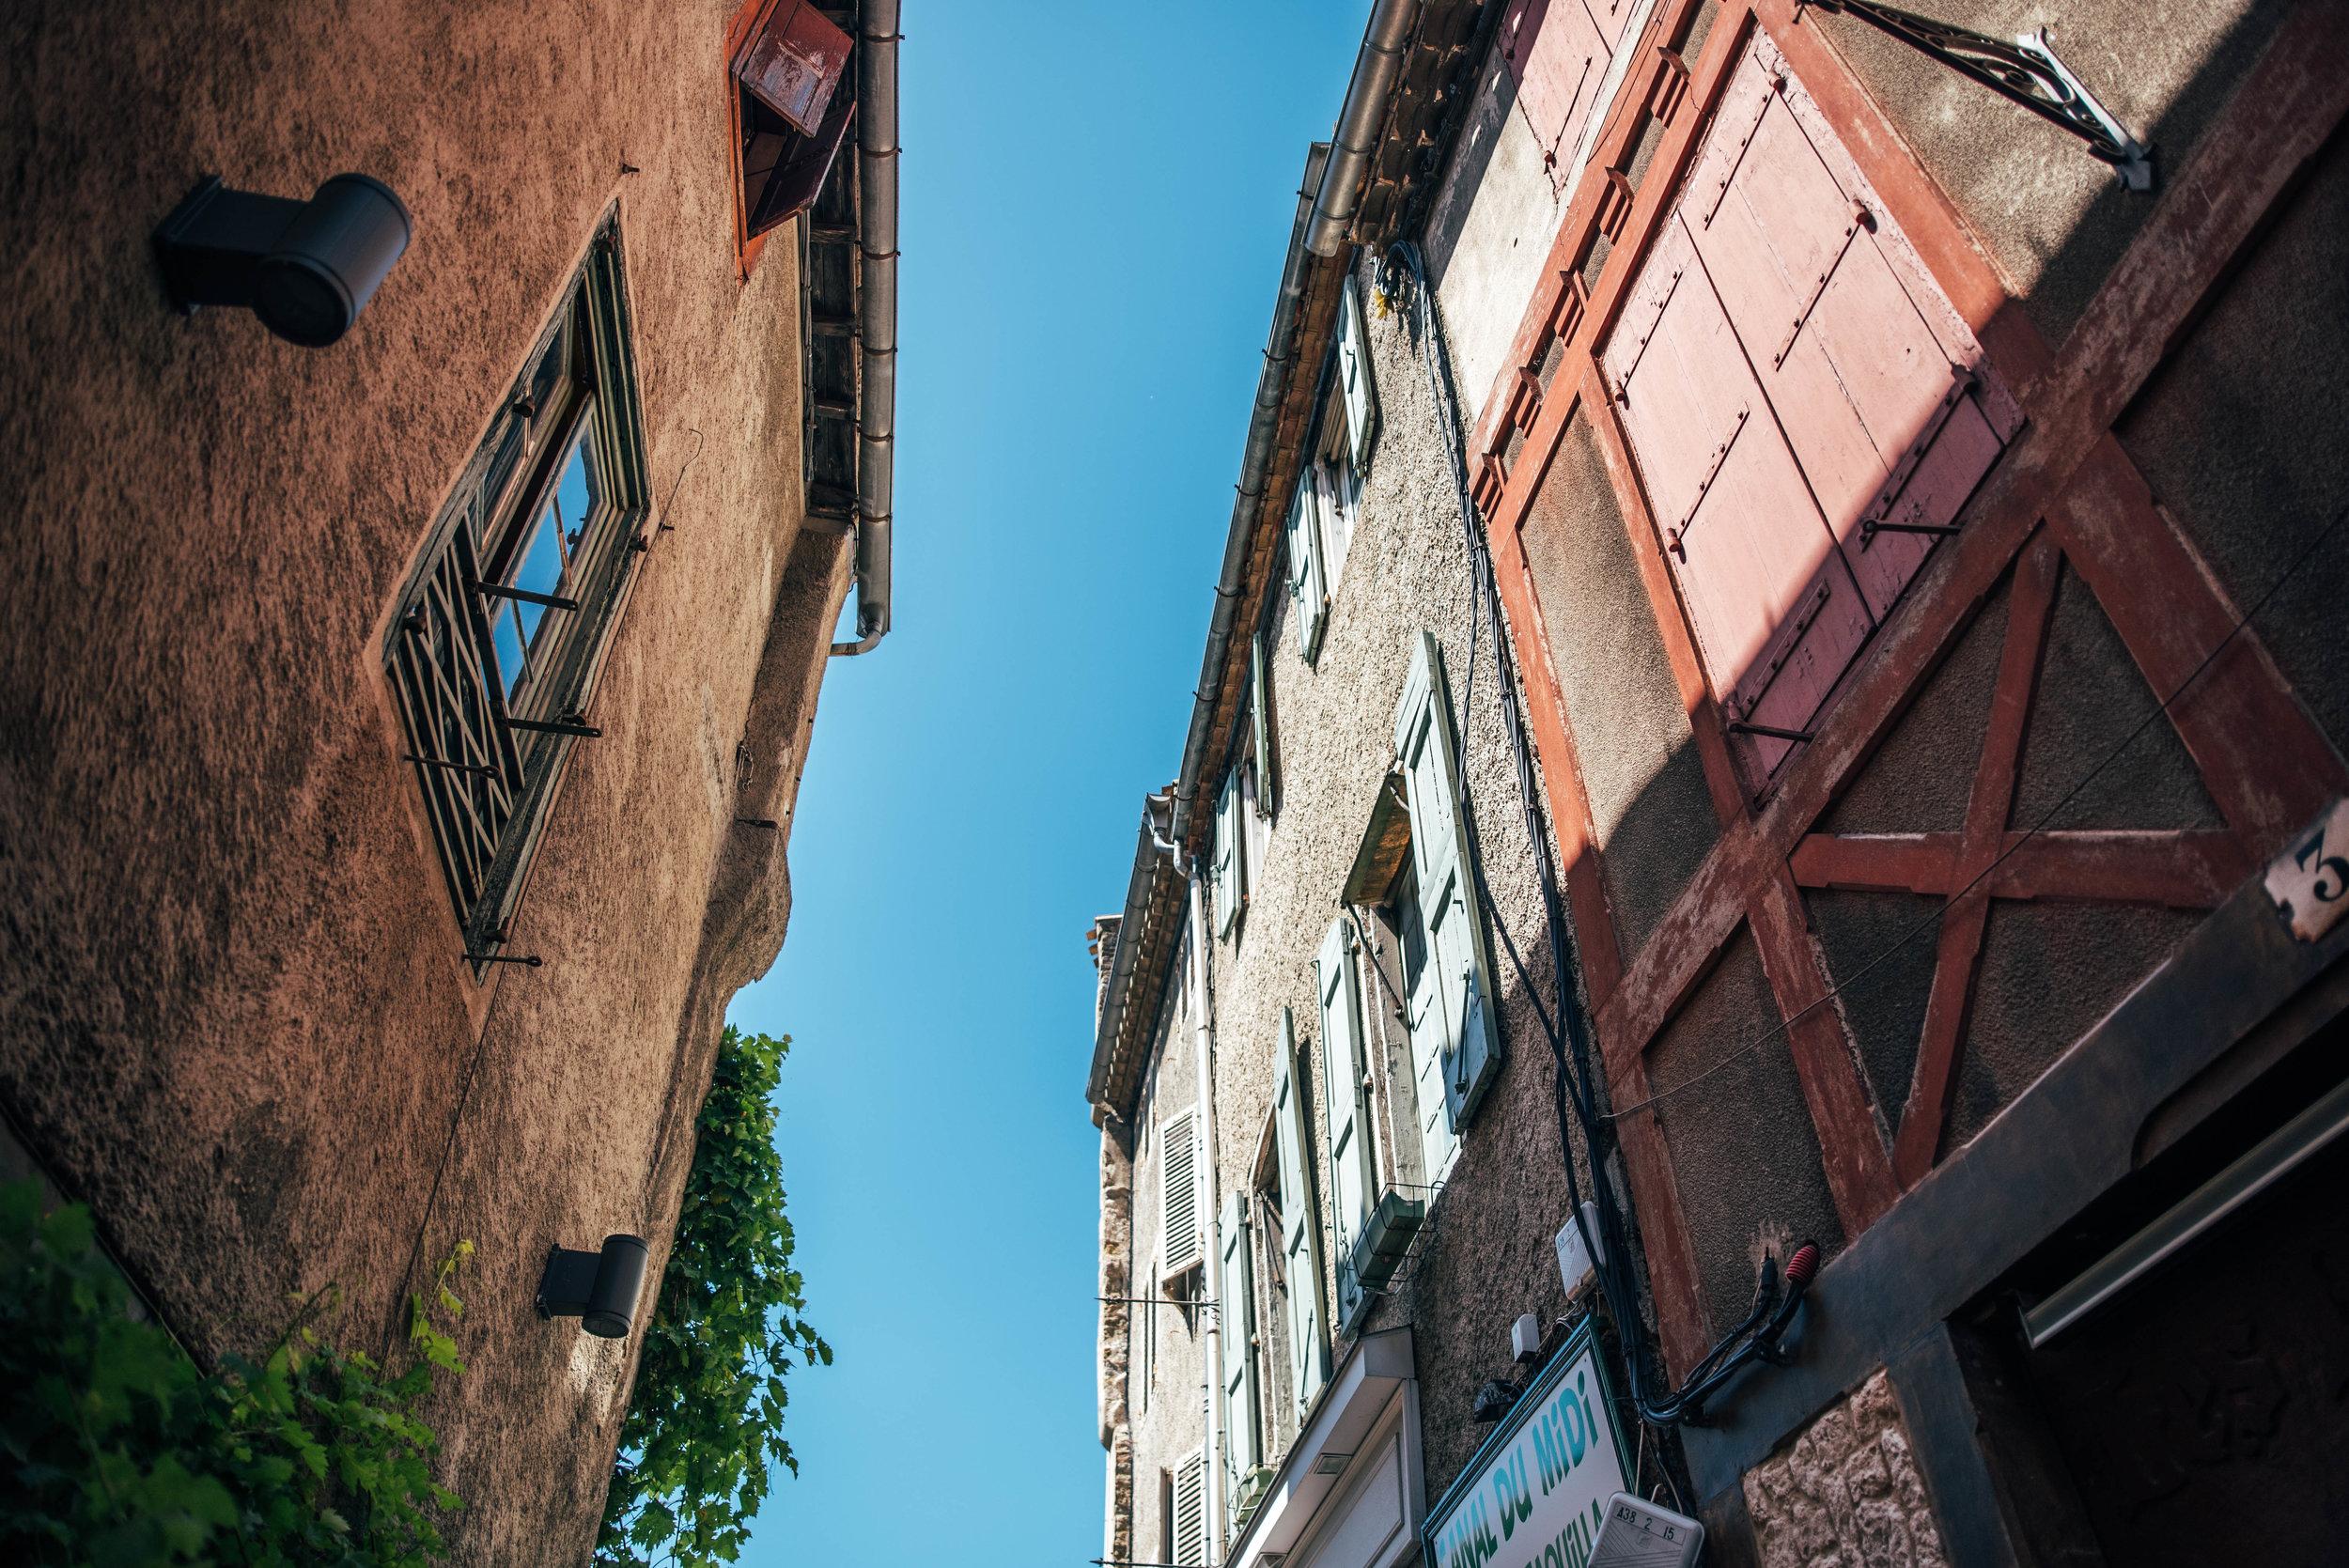 Carcassonne Citadel France Essex UK Documentary Photographer